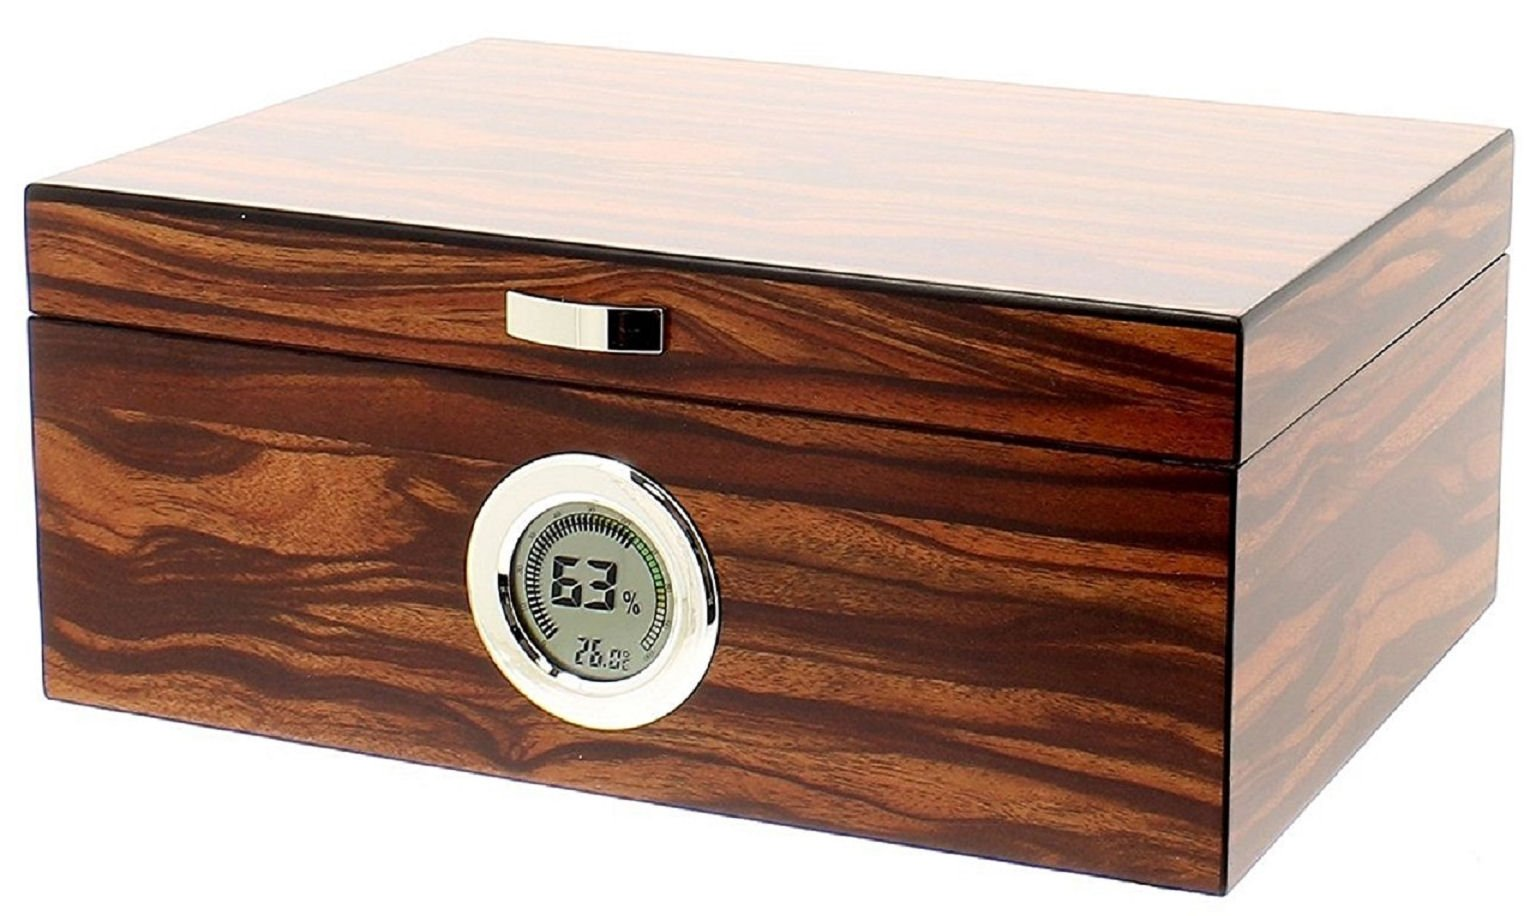 Humidor hold 50 cigars electric (digital) hygrometer